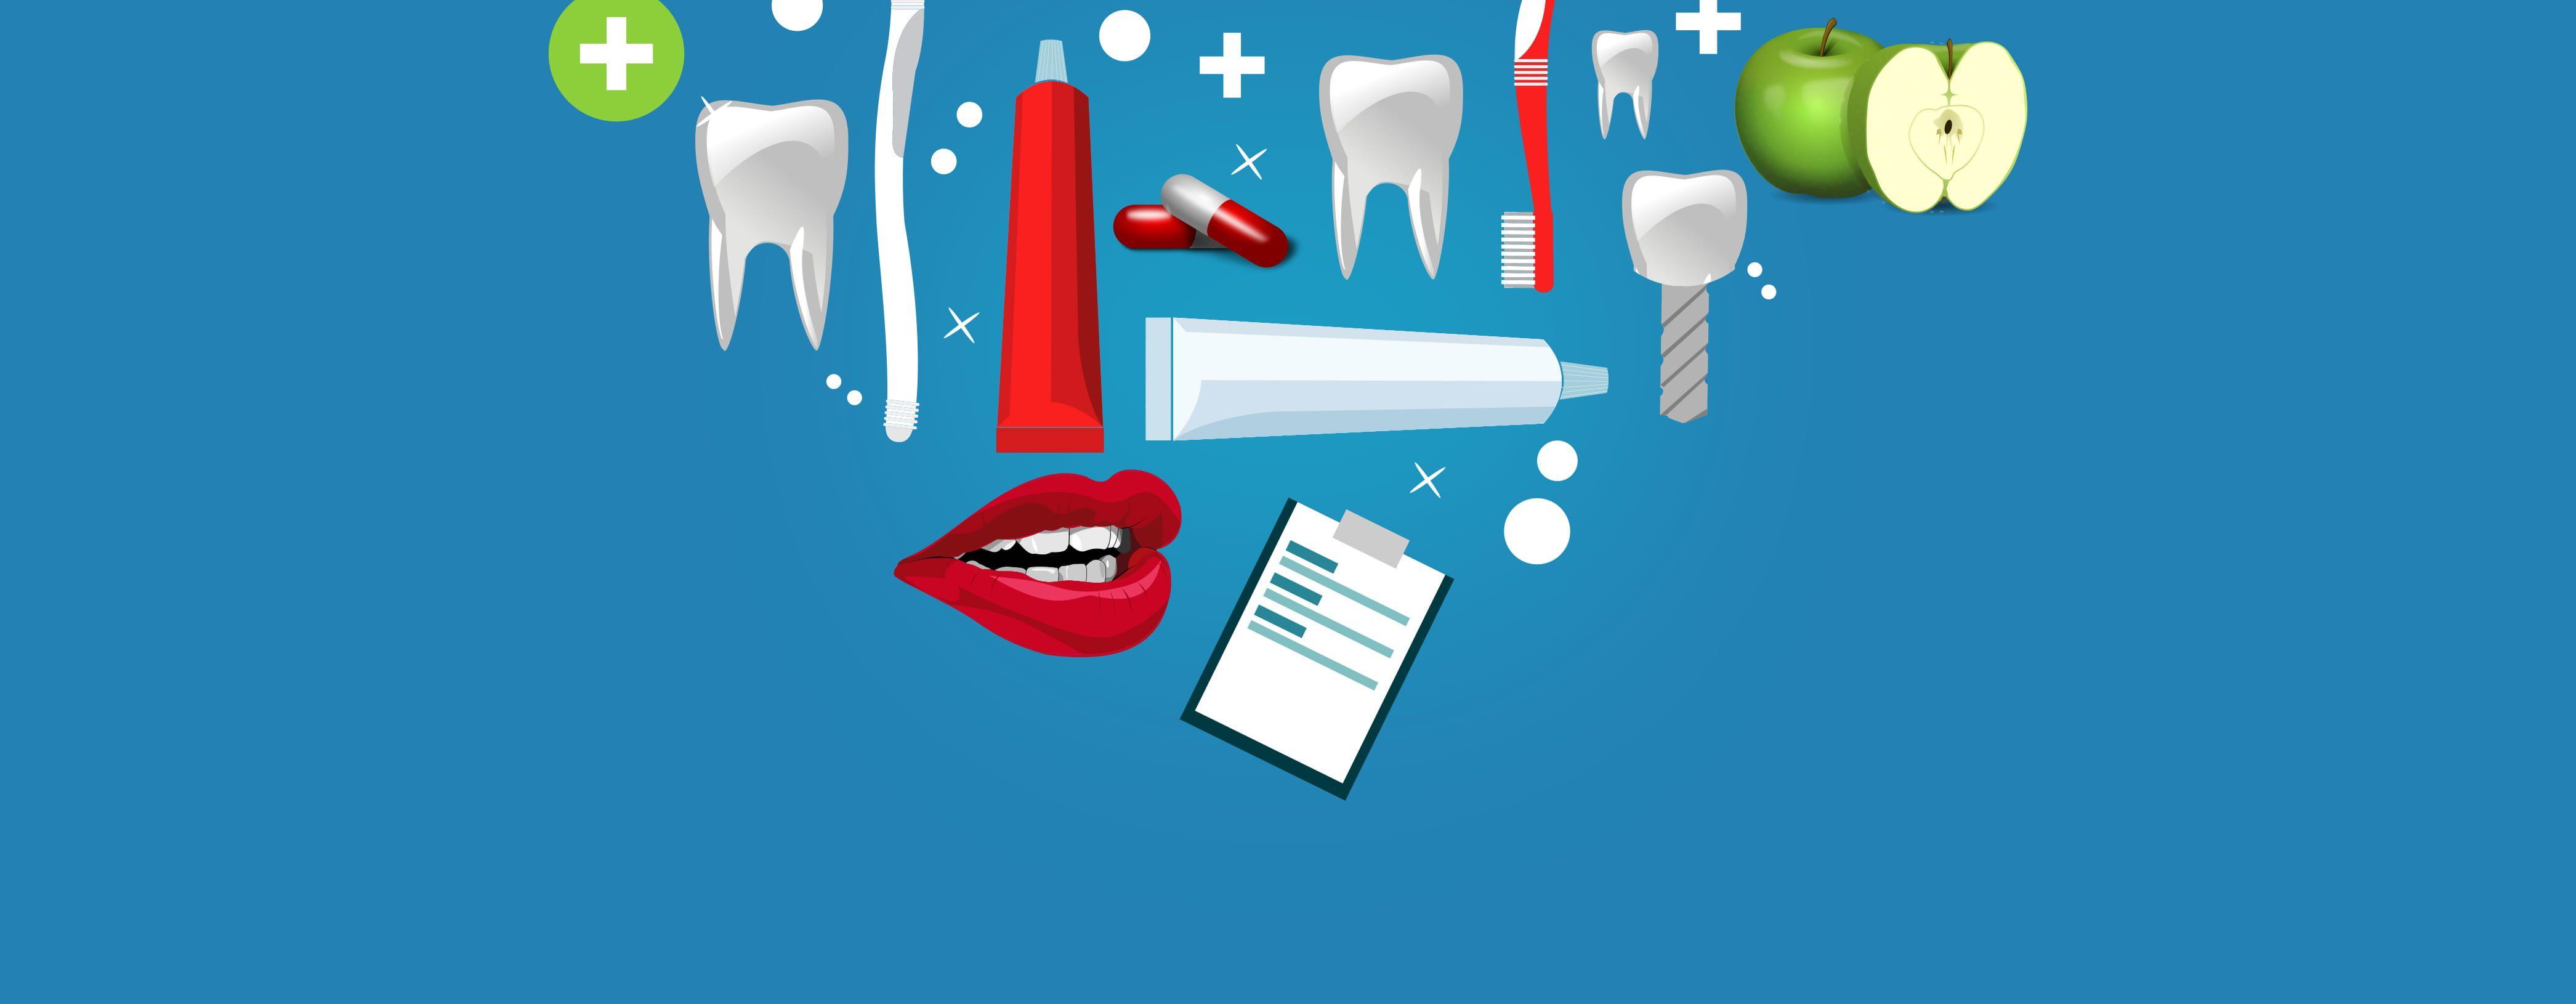 Oral Care Concept - Oral Hygiene Products #dental #dental #care #teeth  #dentistry #art #background #blue #bright #brush #care … | Oral care, Oral  hygiene, Dentistry